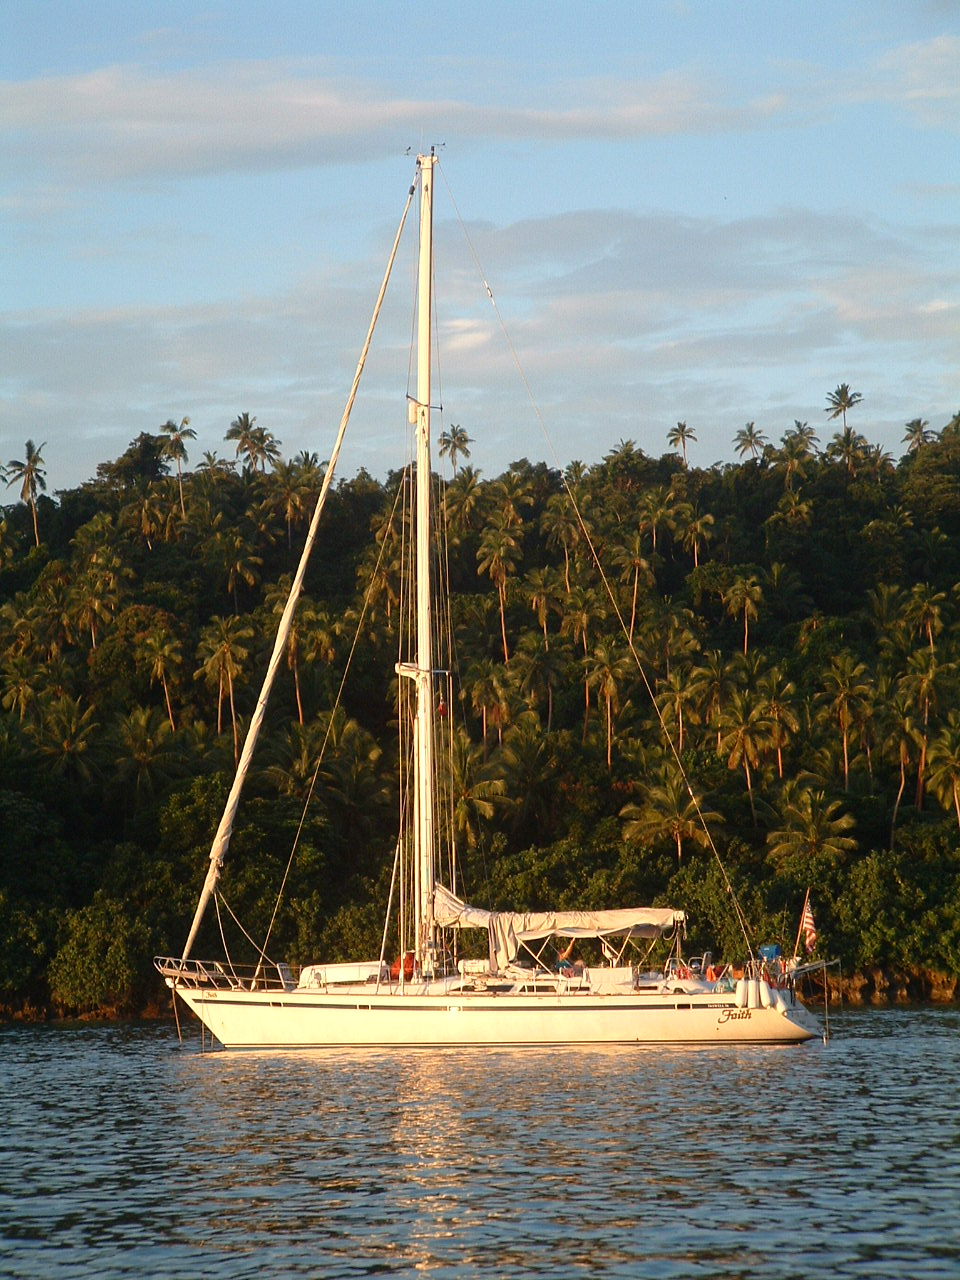 Click image for larger version  Name:Tonga 2 (19).JPG Views:353 Size:308.1 KB ID:11594